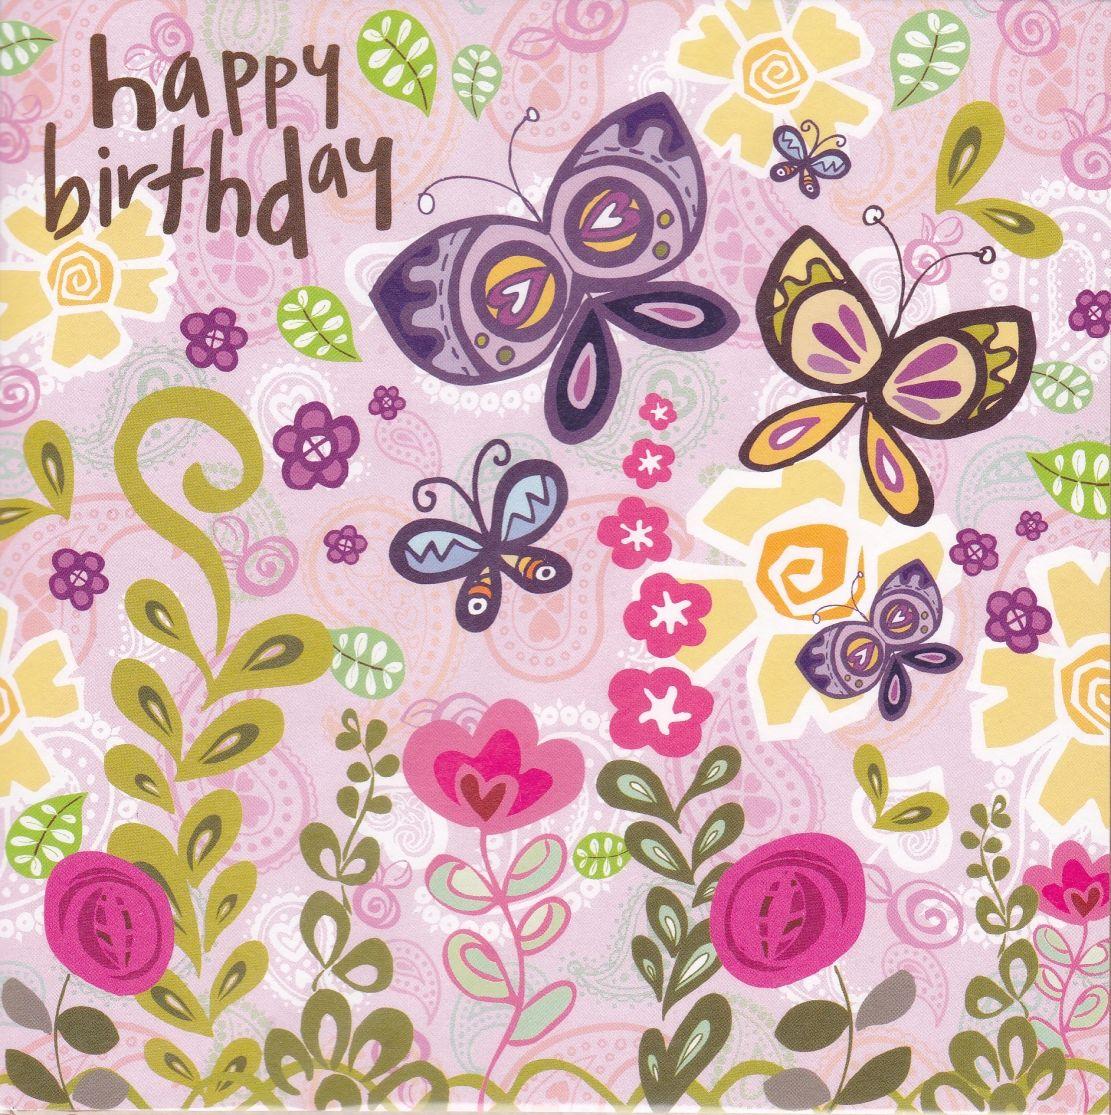 Butterflies Flowers Birthday Card Karenza Paperie